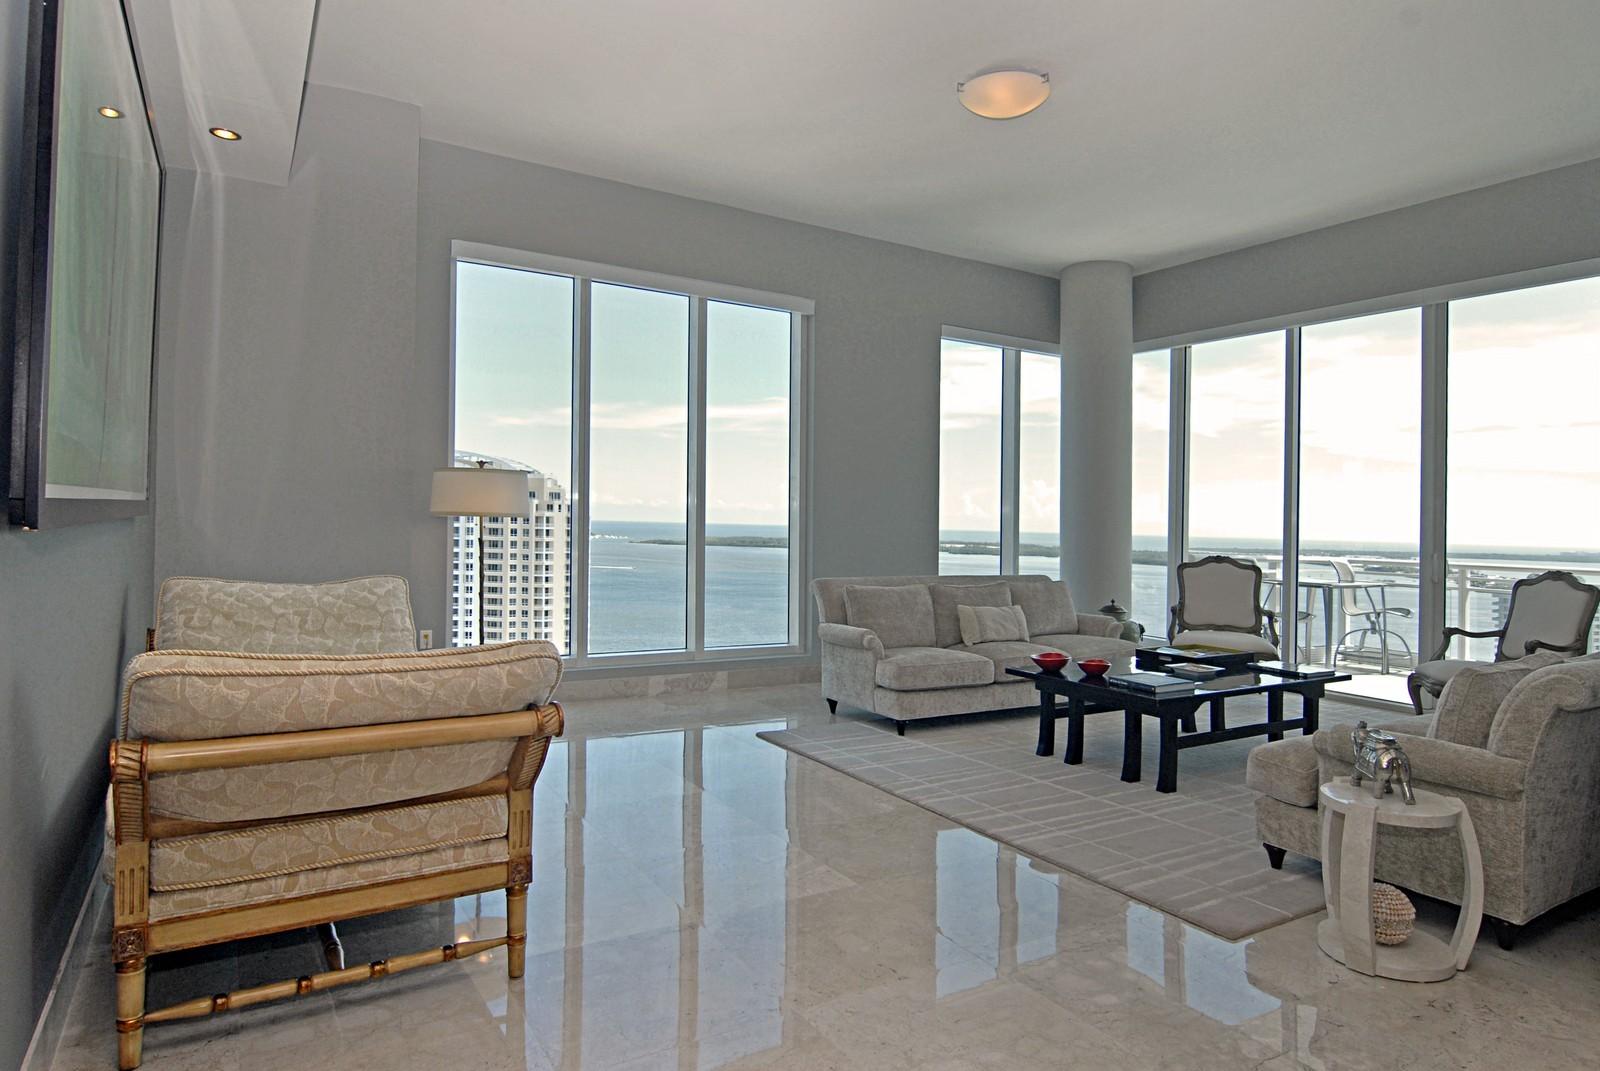 Real Estate Photography - 900 Brickell Key Blvd, Apt 3004, Miami, FL, 33131 - Living Room